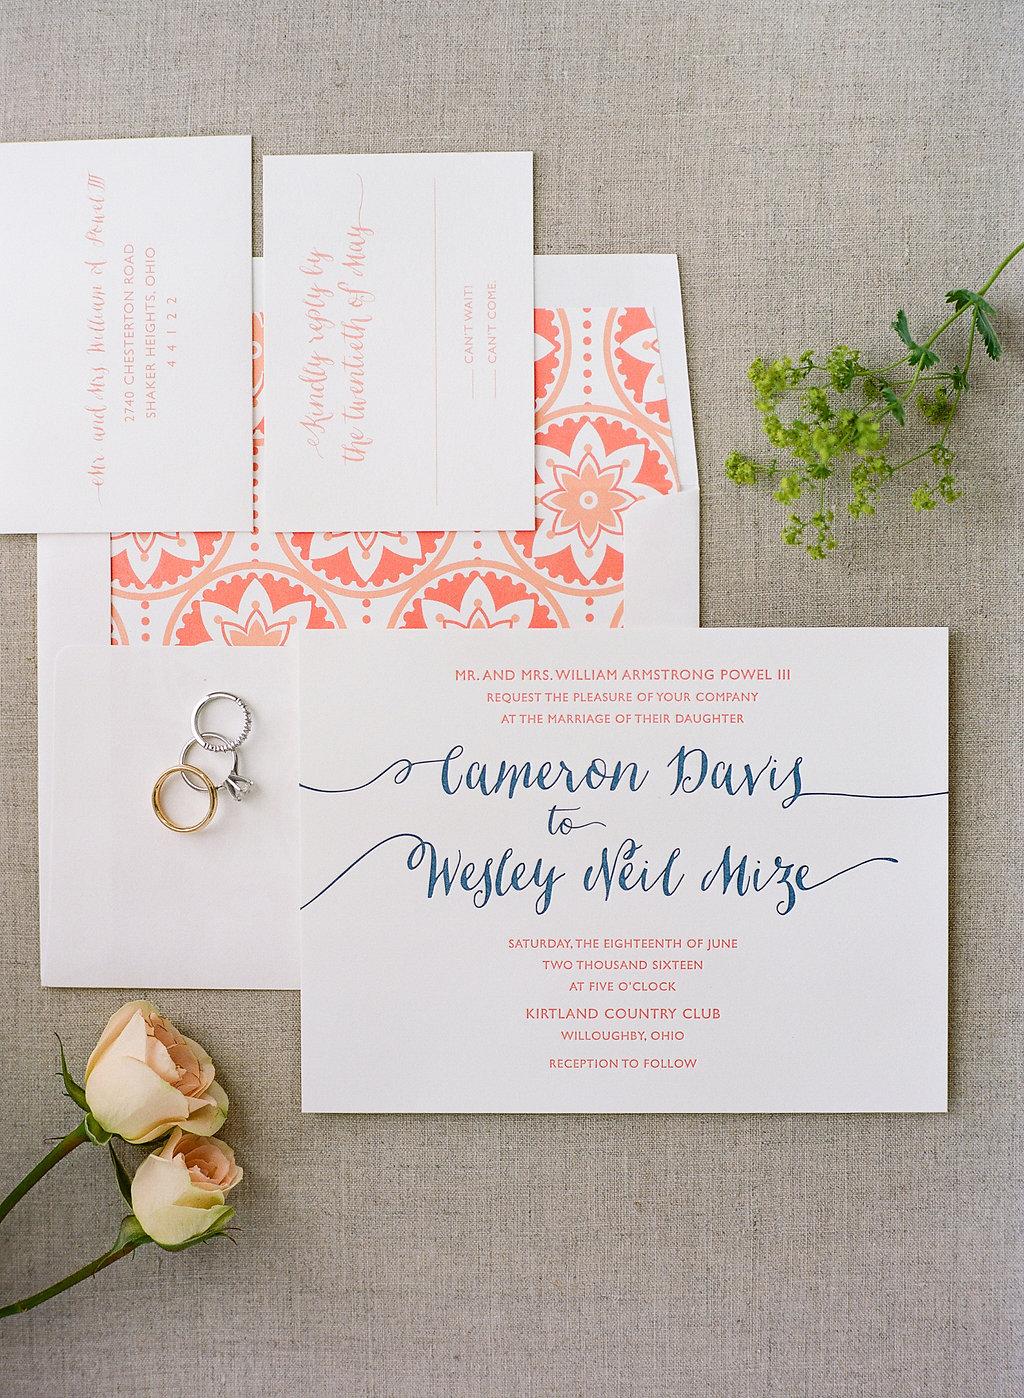 Cameron-Powel-Wes-Mize-wedding-20160618-013.jpg